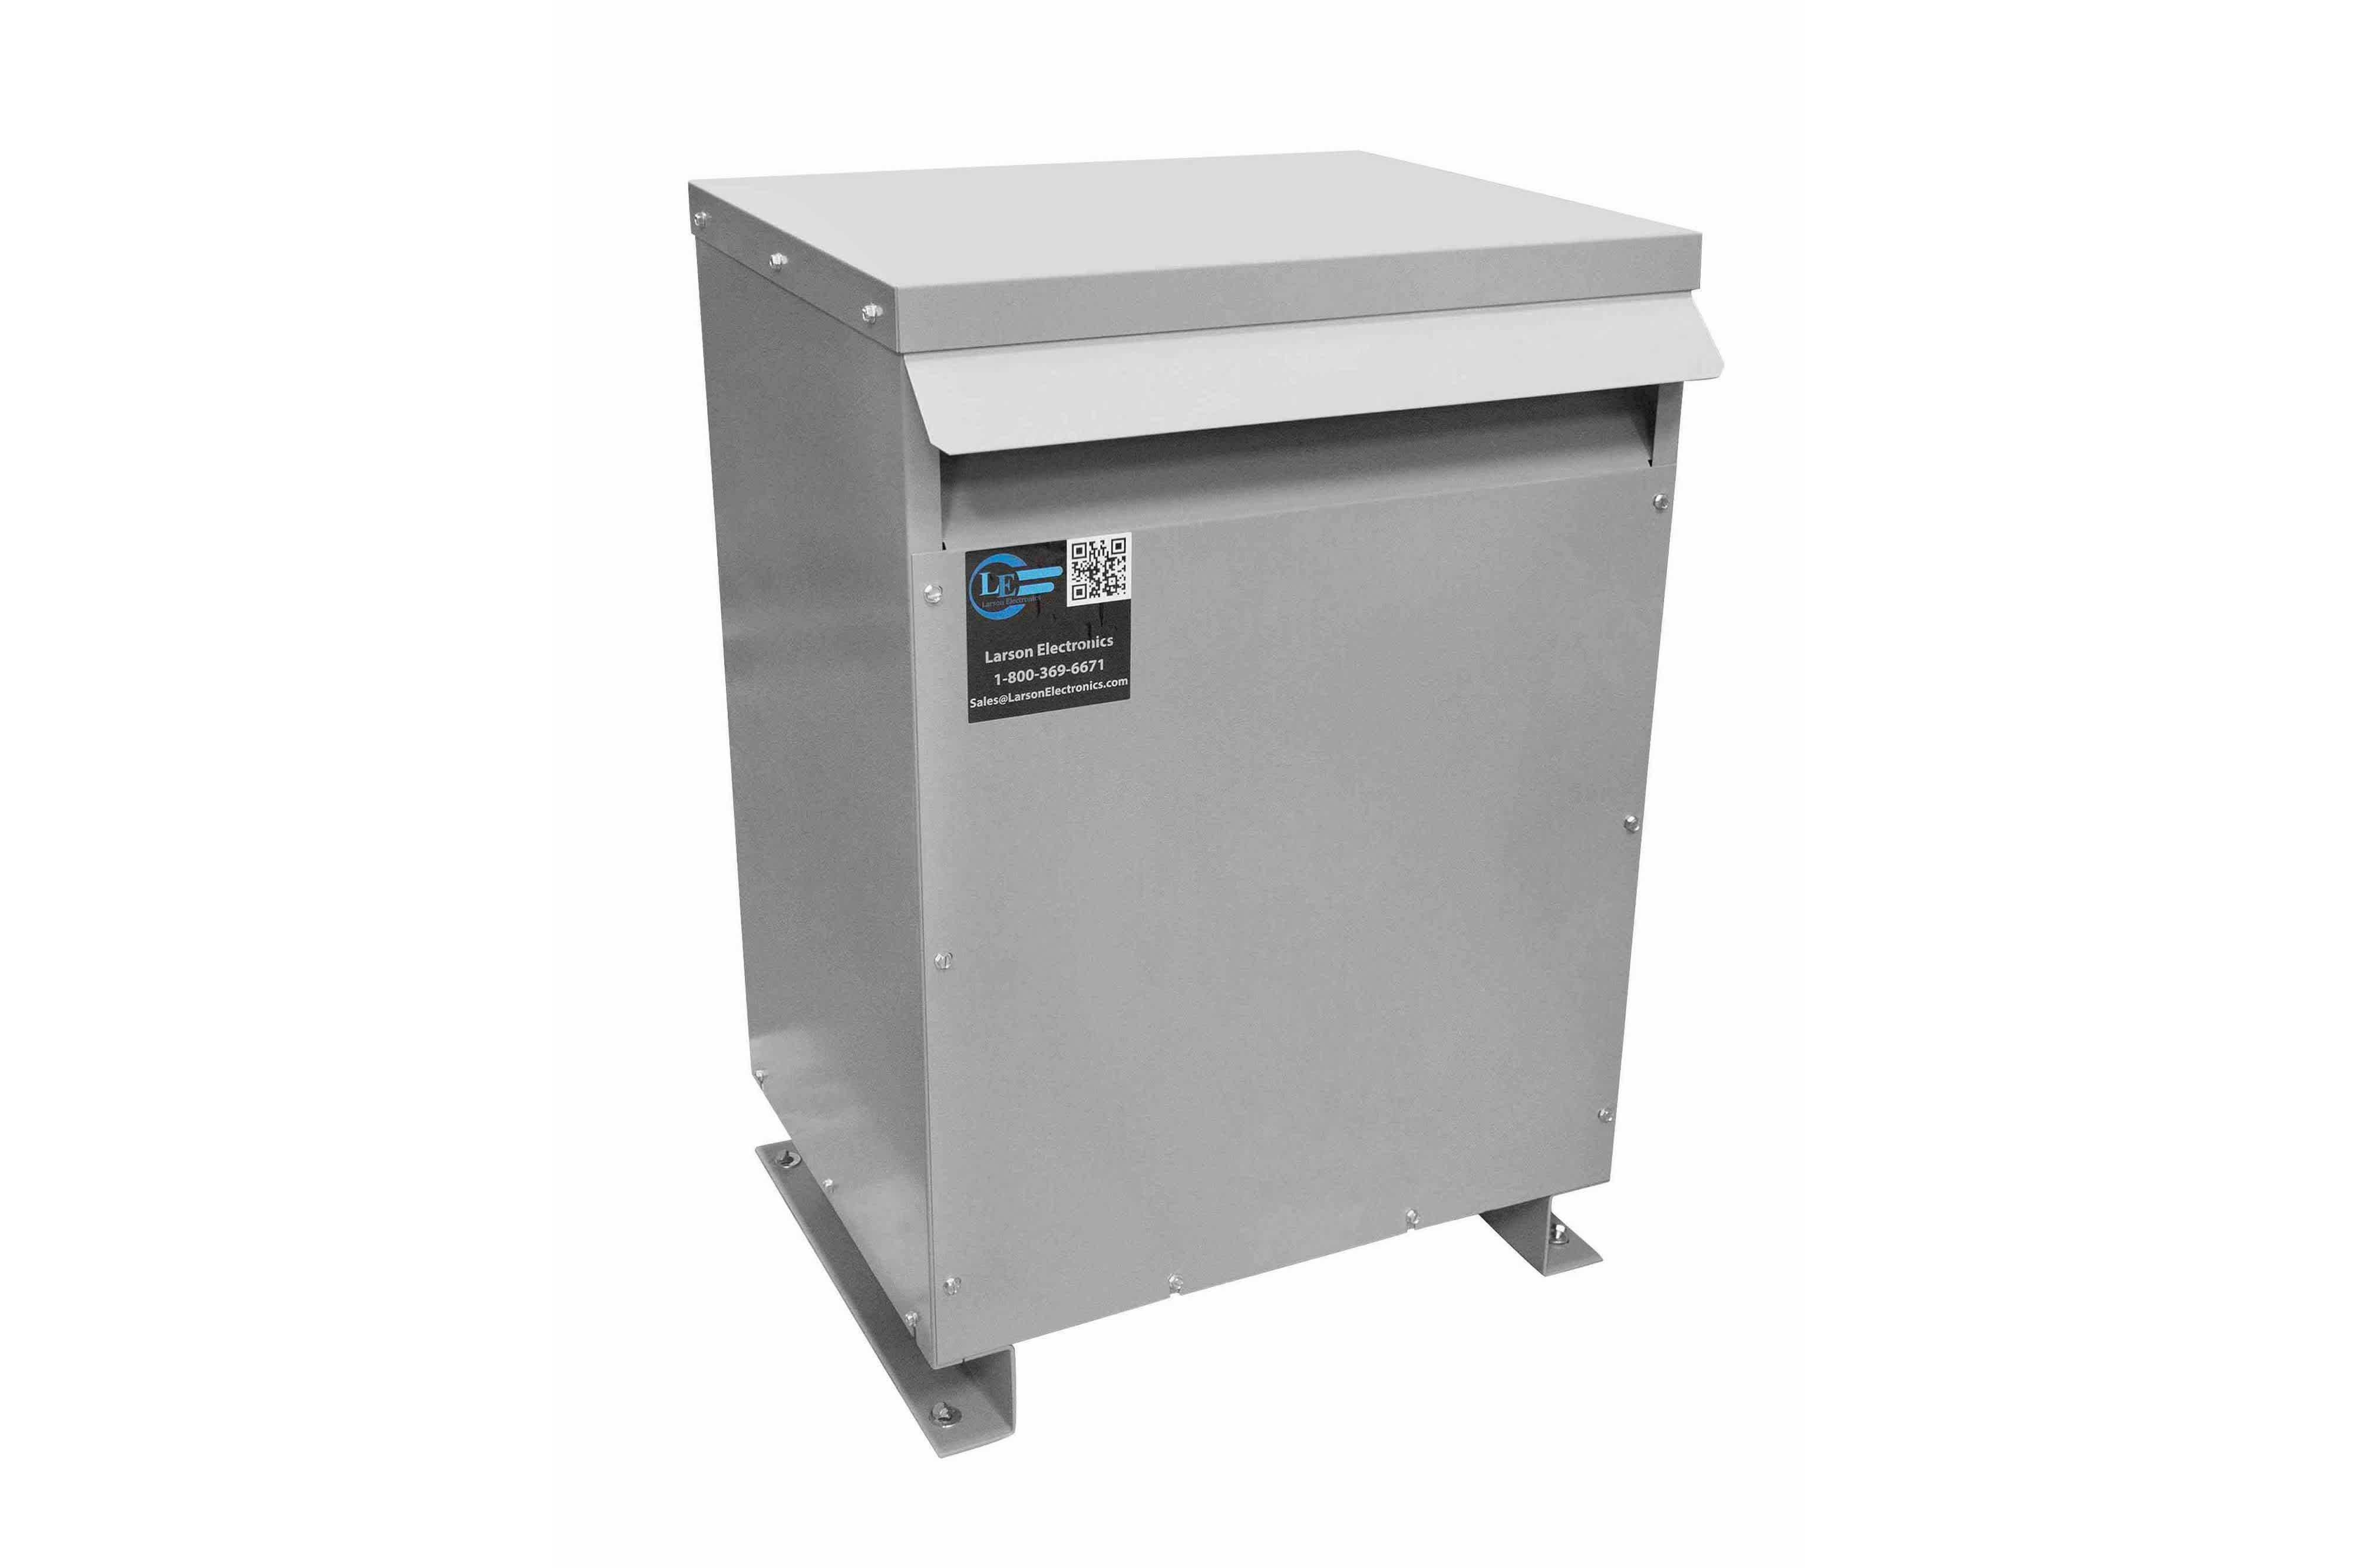 36 kVA 3PH DOE Transformer, 600V Delta Primary, 208Y/120 Wye-N Secondary, N3R, Ventilated, 60 Hz